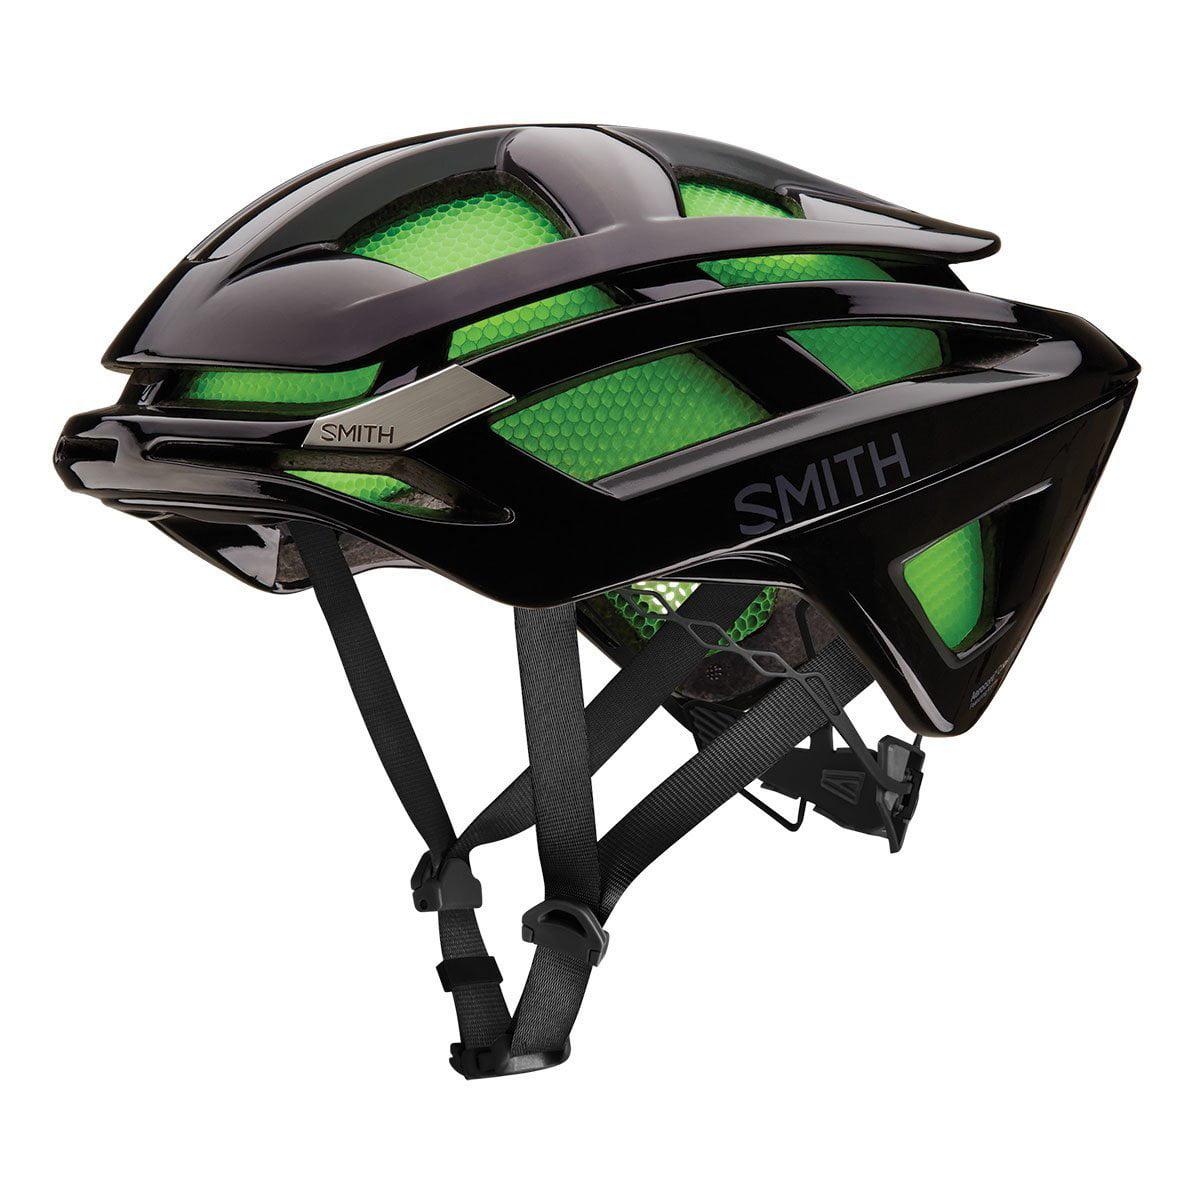 Smith Optics Overtake Bike Adult Off-Road Cycling Helmet